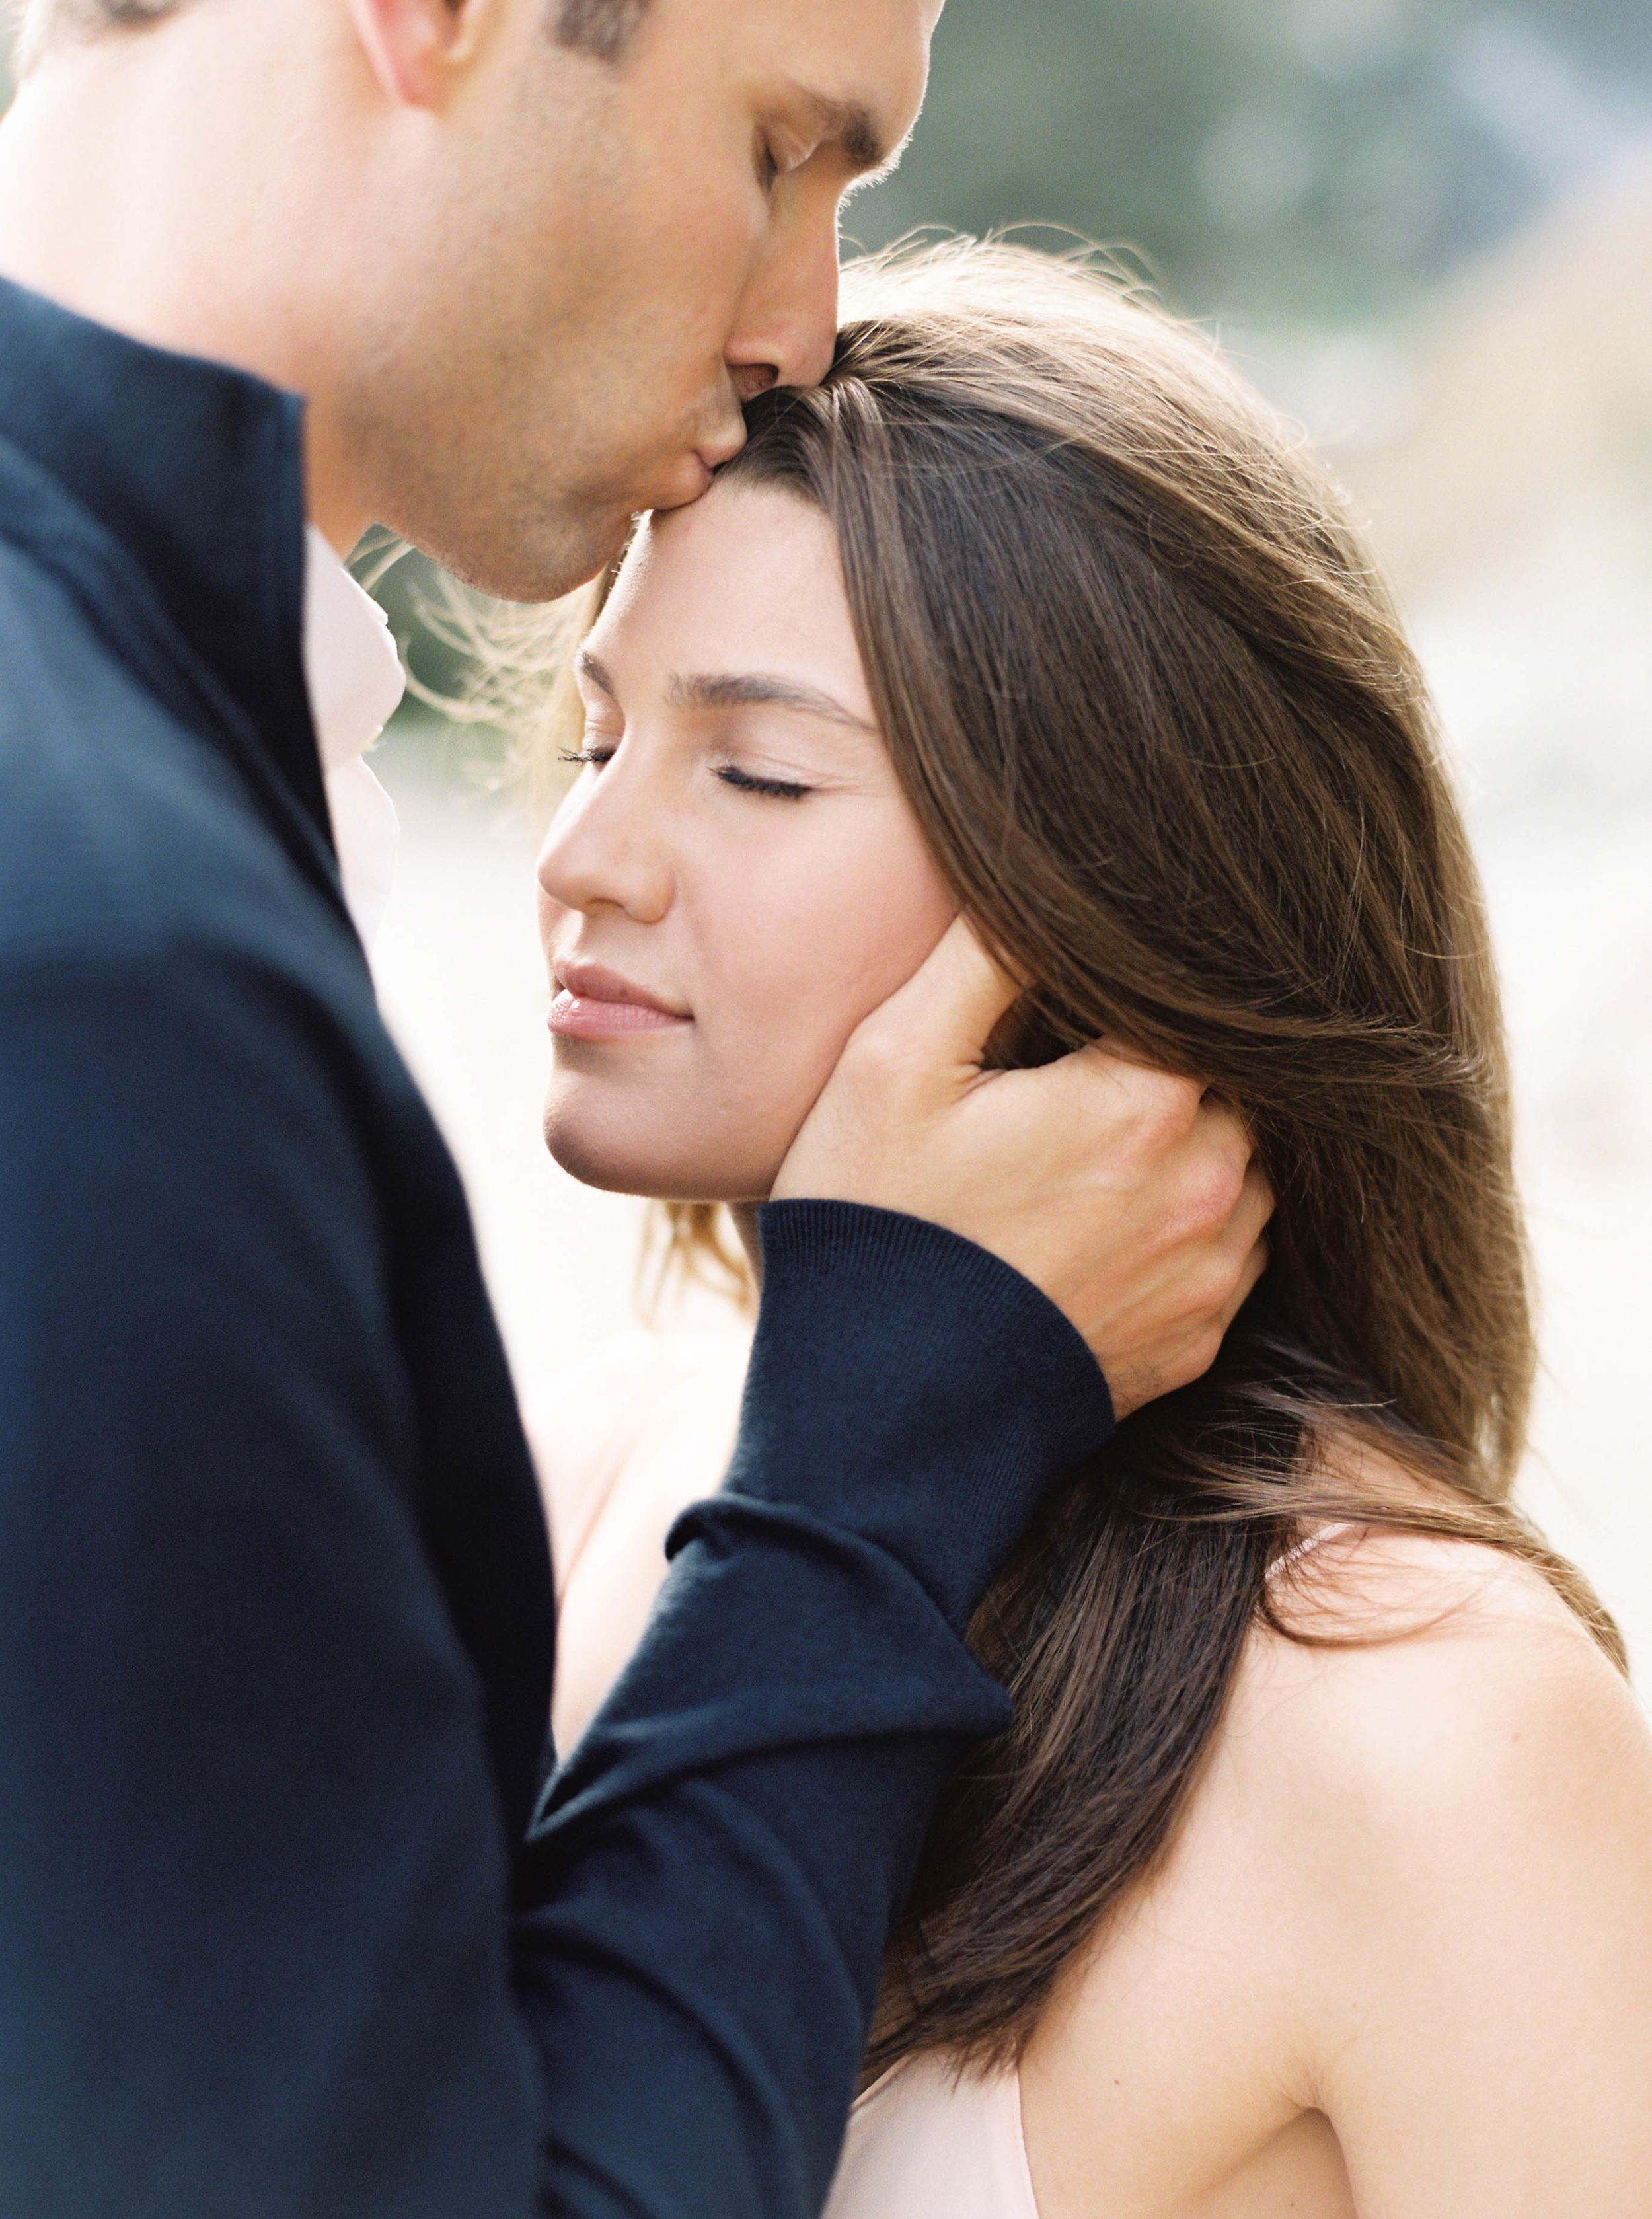 Meghan Mehan Photography - Fine Art Film Wedding Photography - San Francisco | Napa | Sonoma | Big Sur | Santa Barbara - 002.jpg